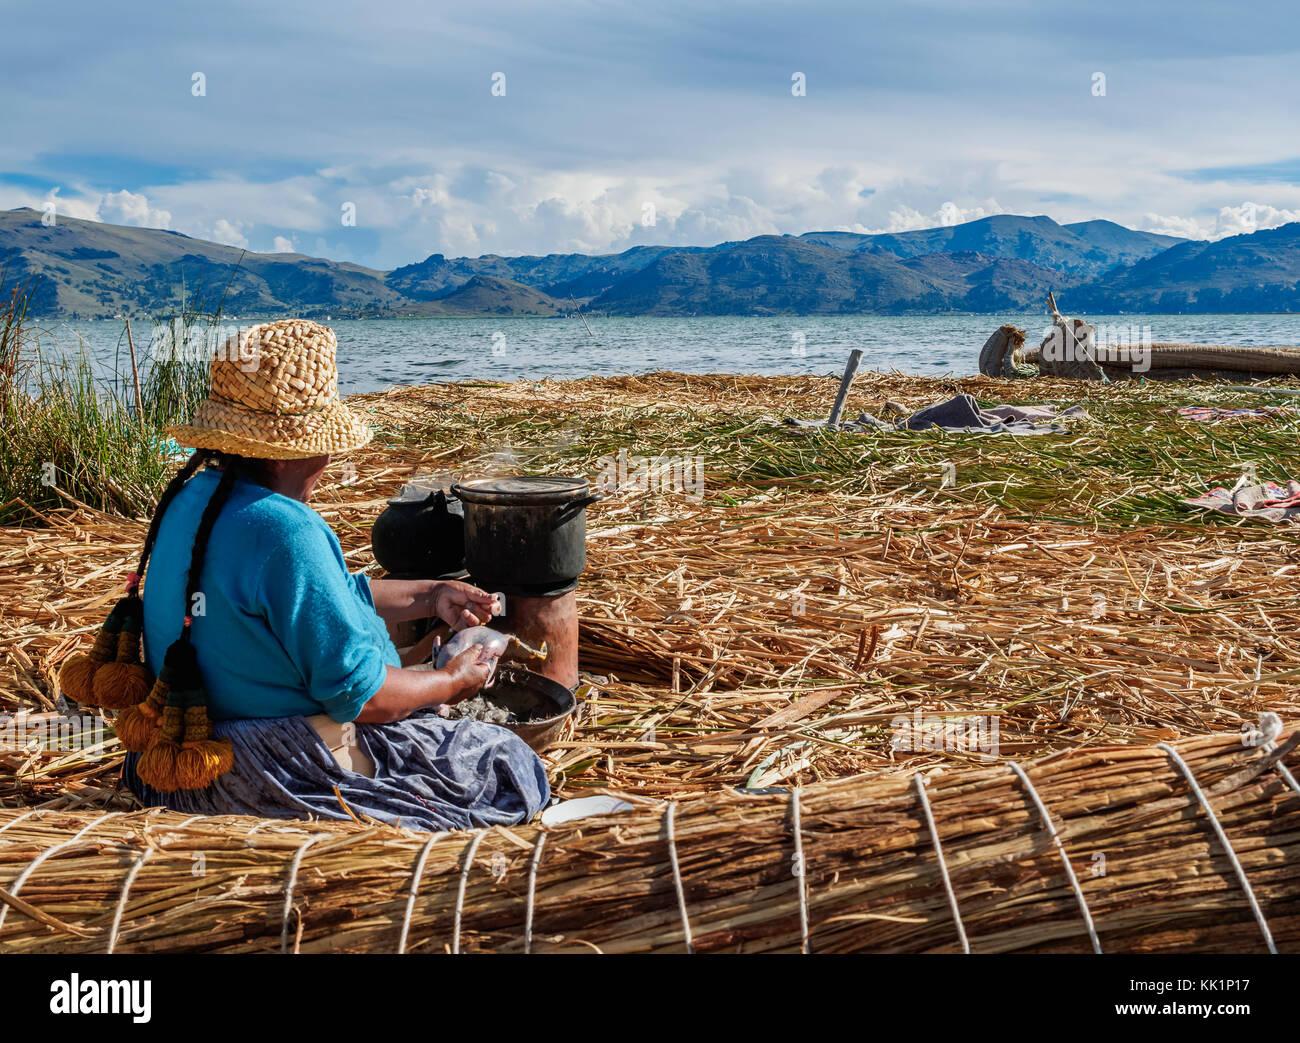 Native Uro Lady cooking, Uros Floating Islands, Lake Titicaca, Puno Region, Peru - Stock Image